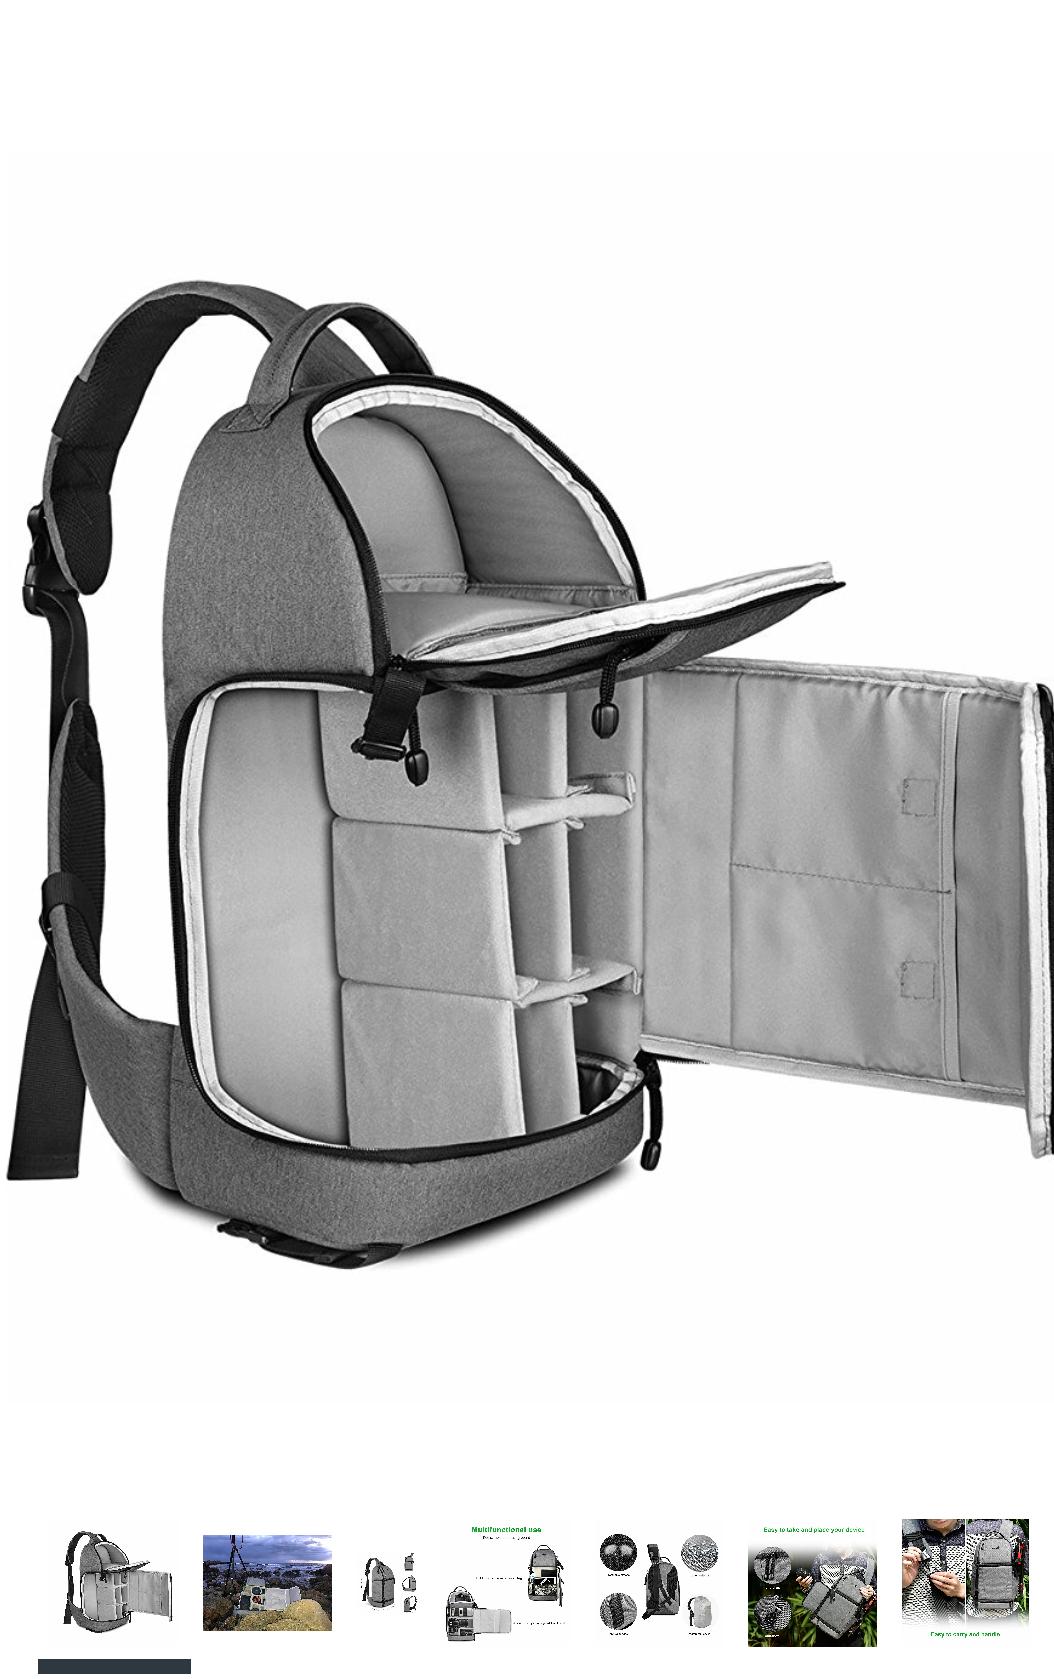 Oferta Flash mochila reflex